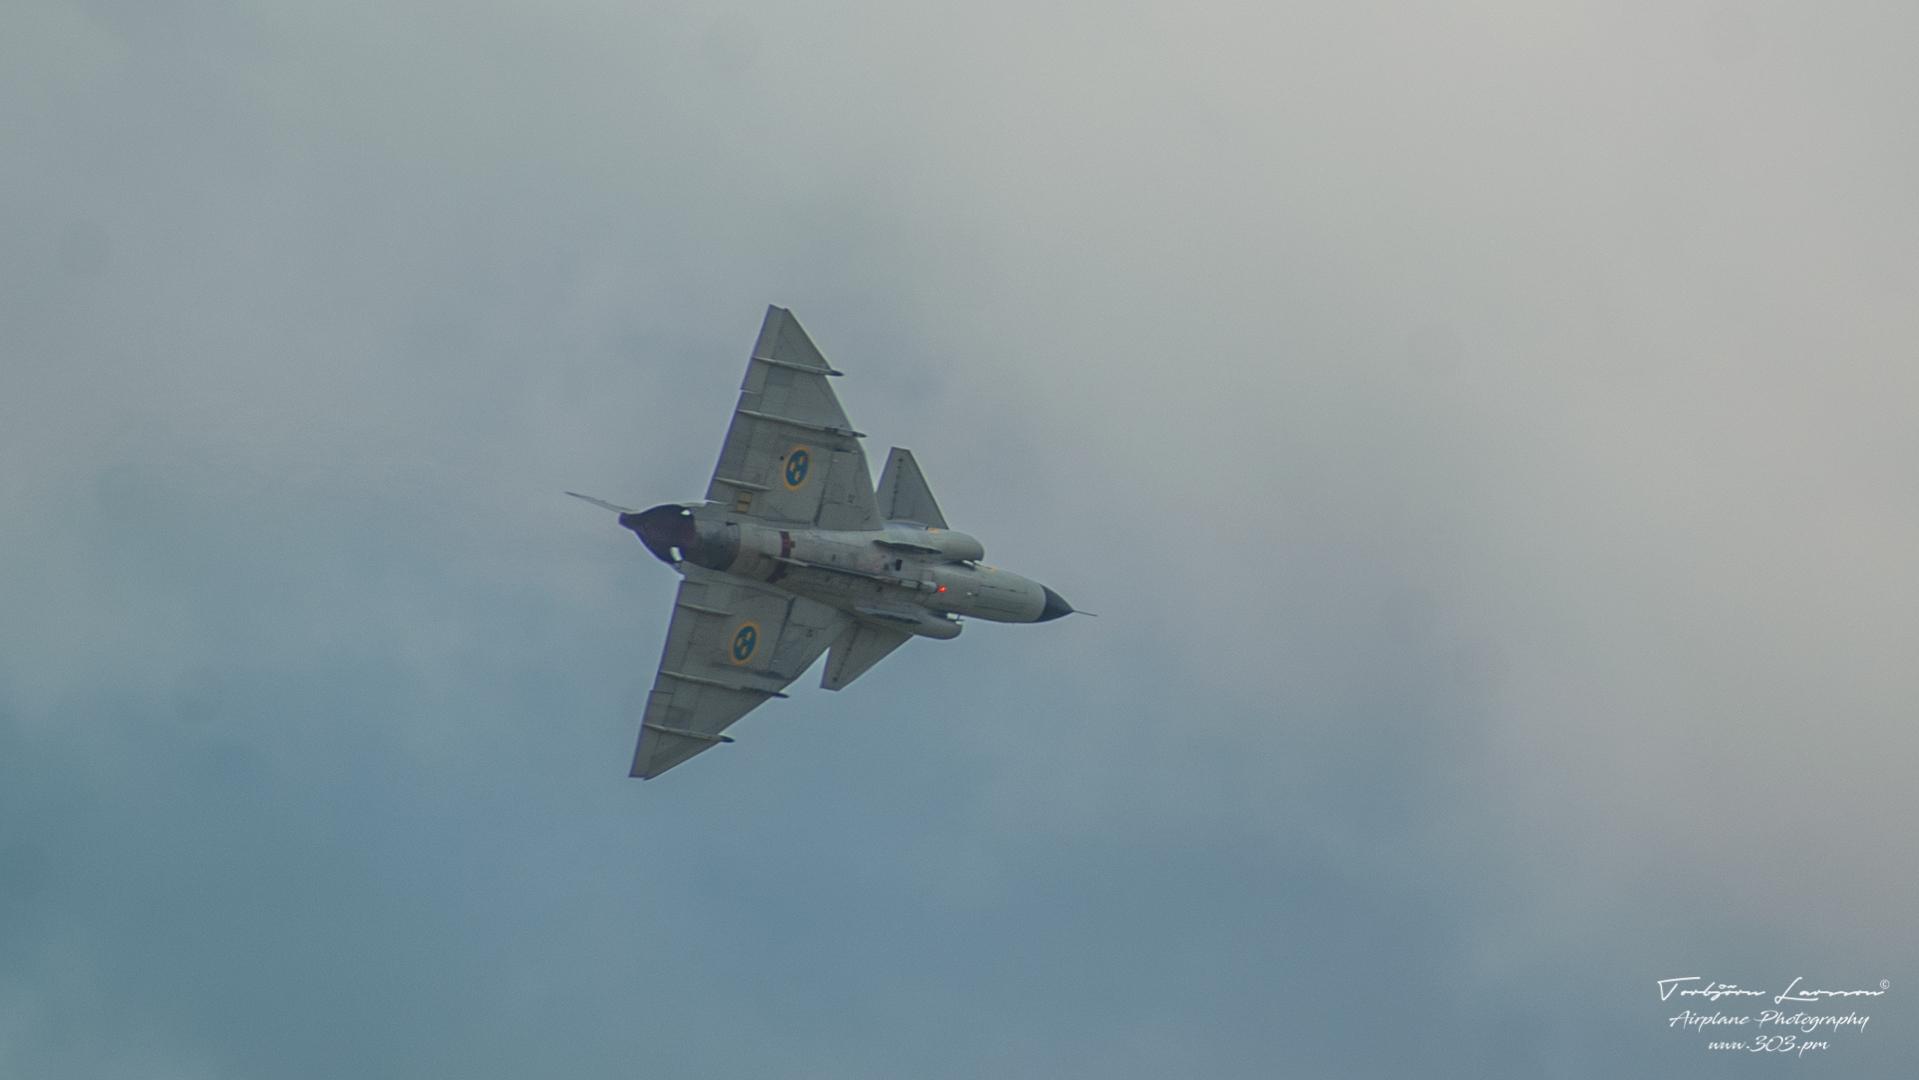 AJ-37 Viggen